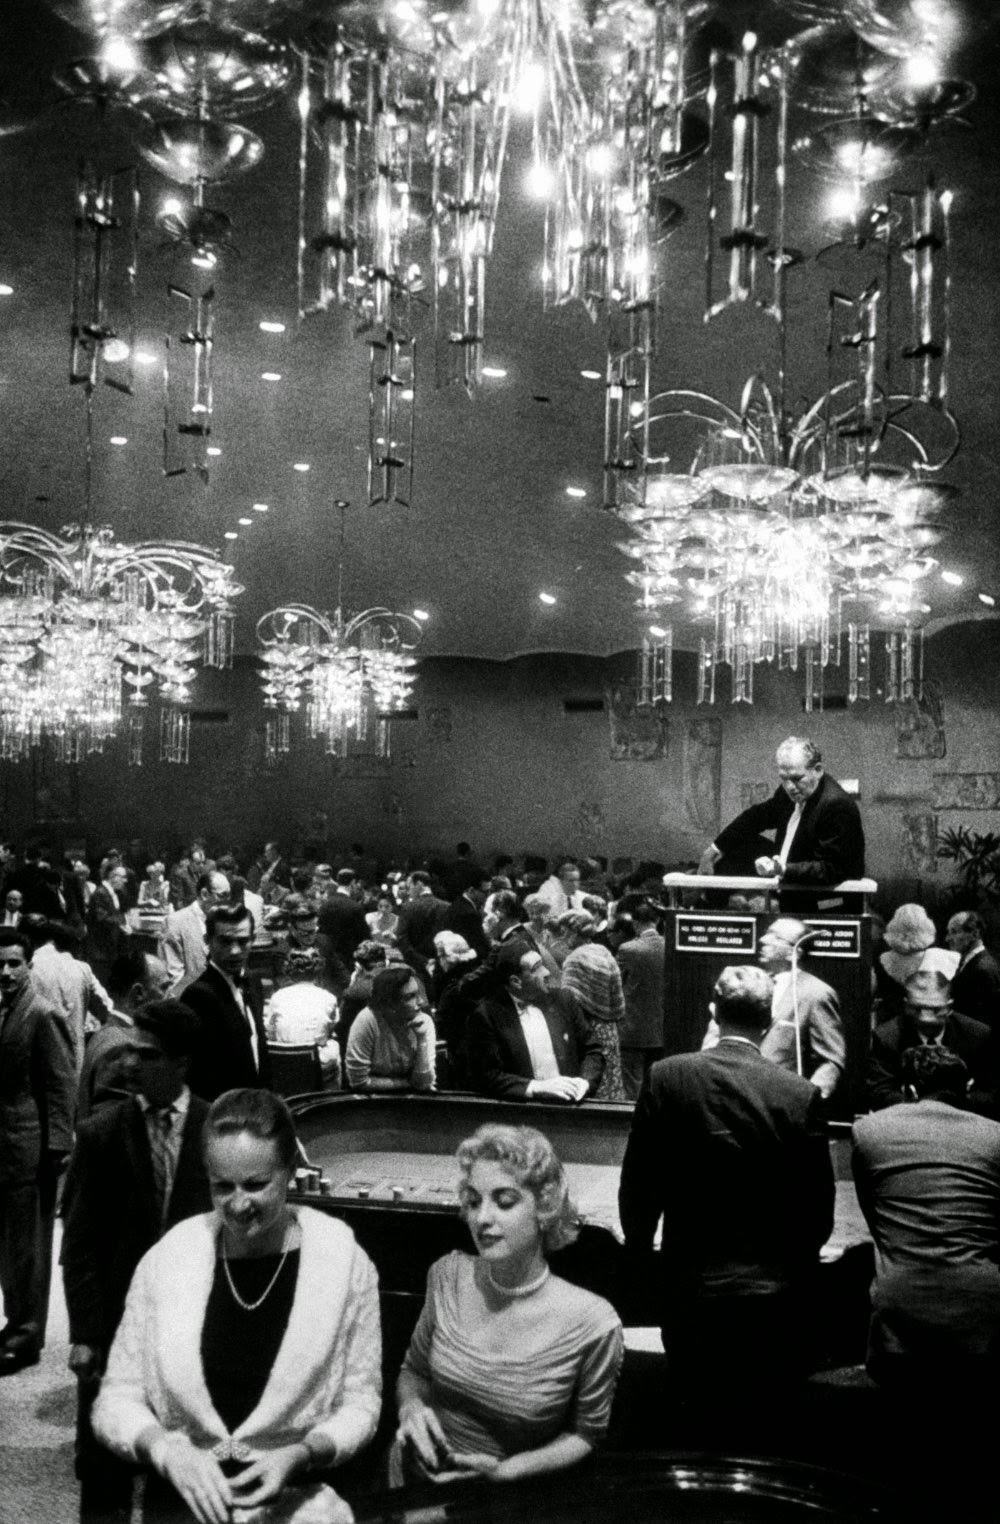 Havana gambling